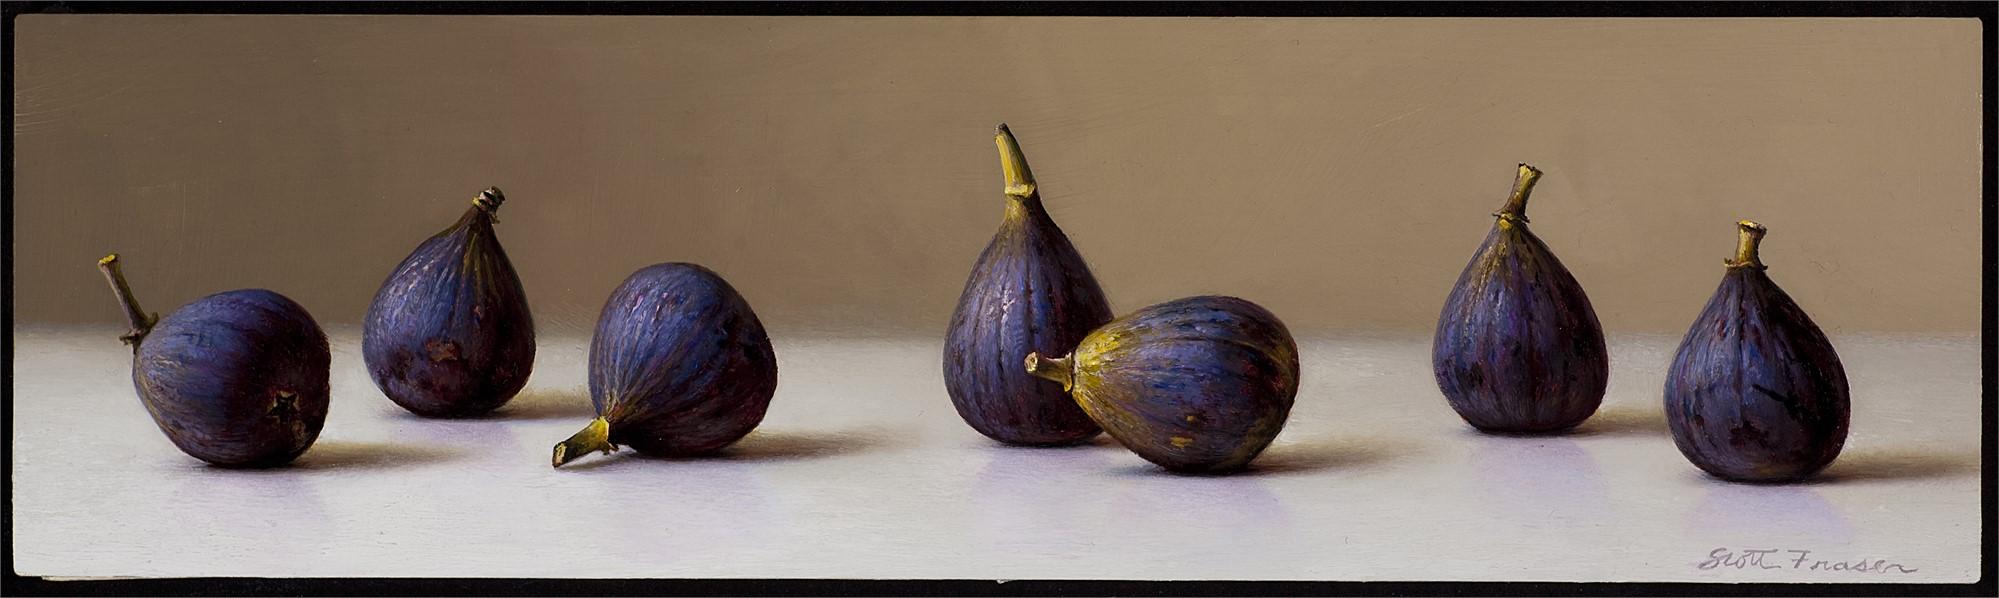 Seven Figs by Scott Fraser